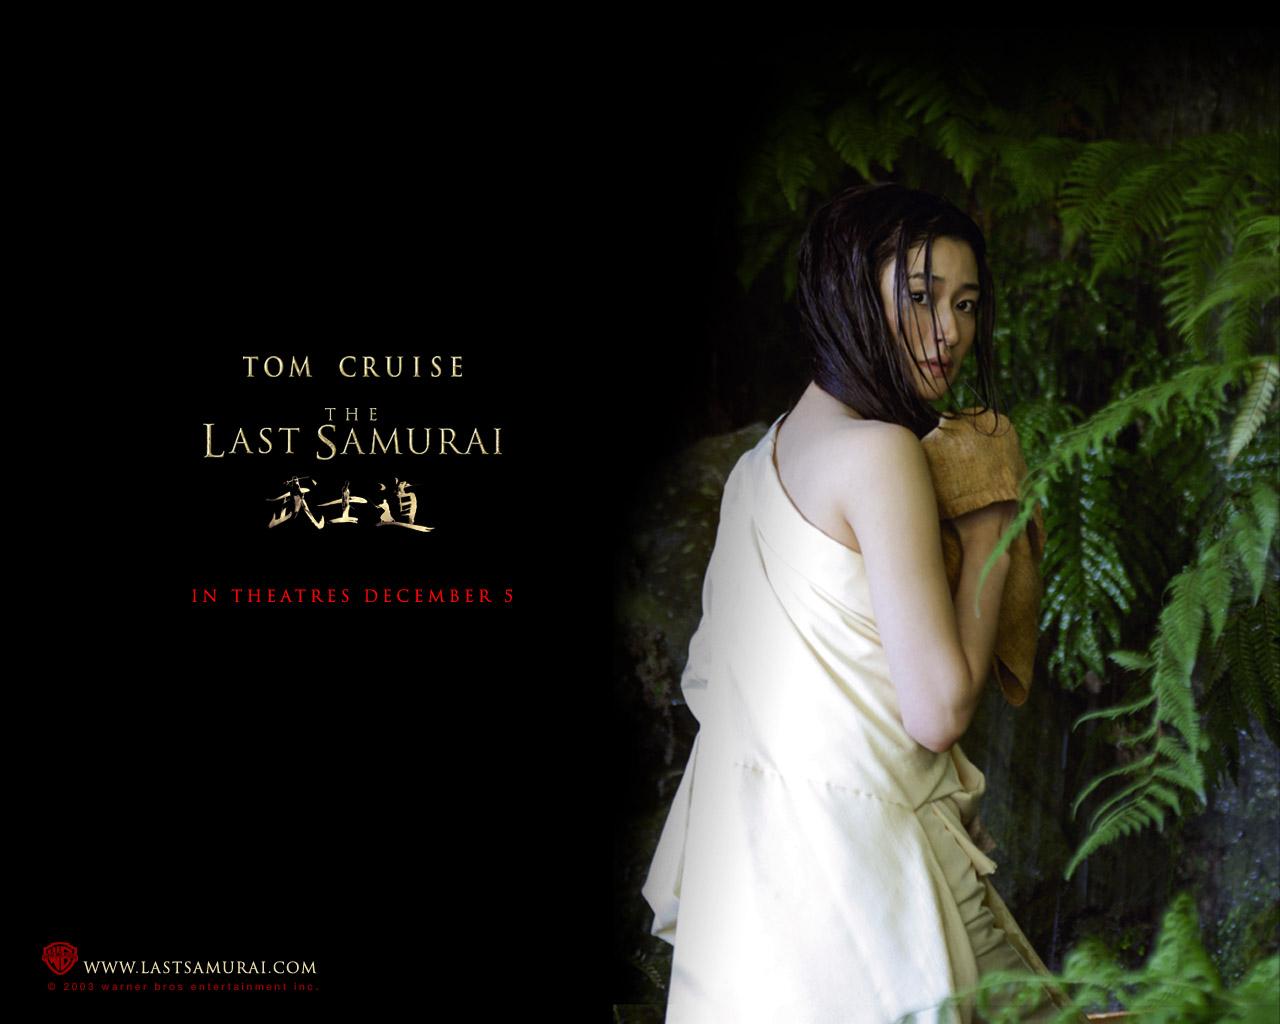 Sword The Last Samurai Tom Cruise Ujio Nathan Algren Nature 1280x1024